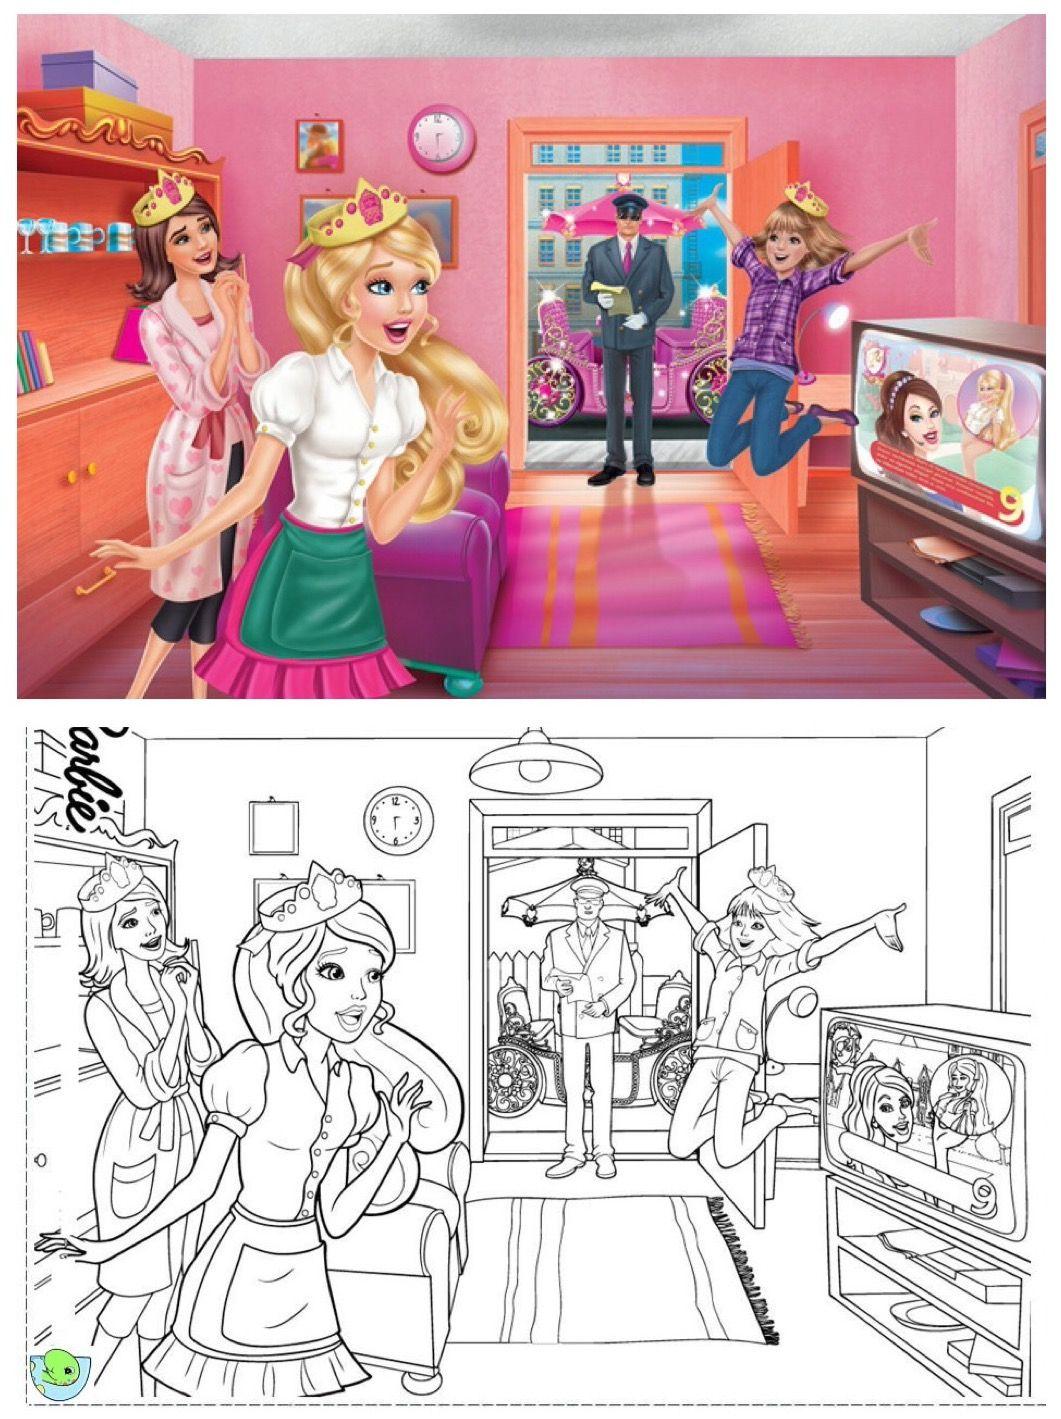 Pin de Virginia Kelly en coloring posters for kids   Pinterest